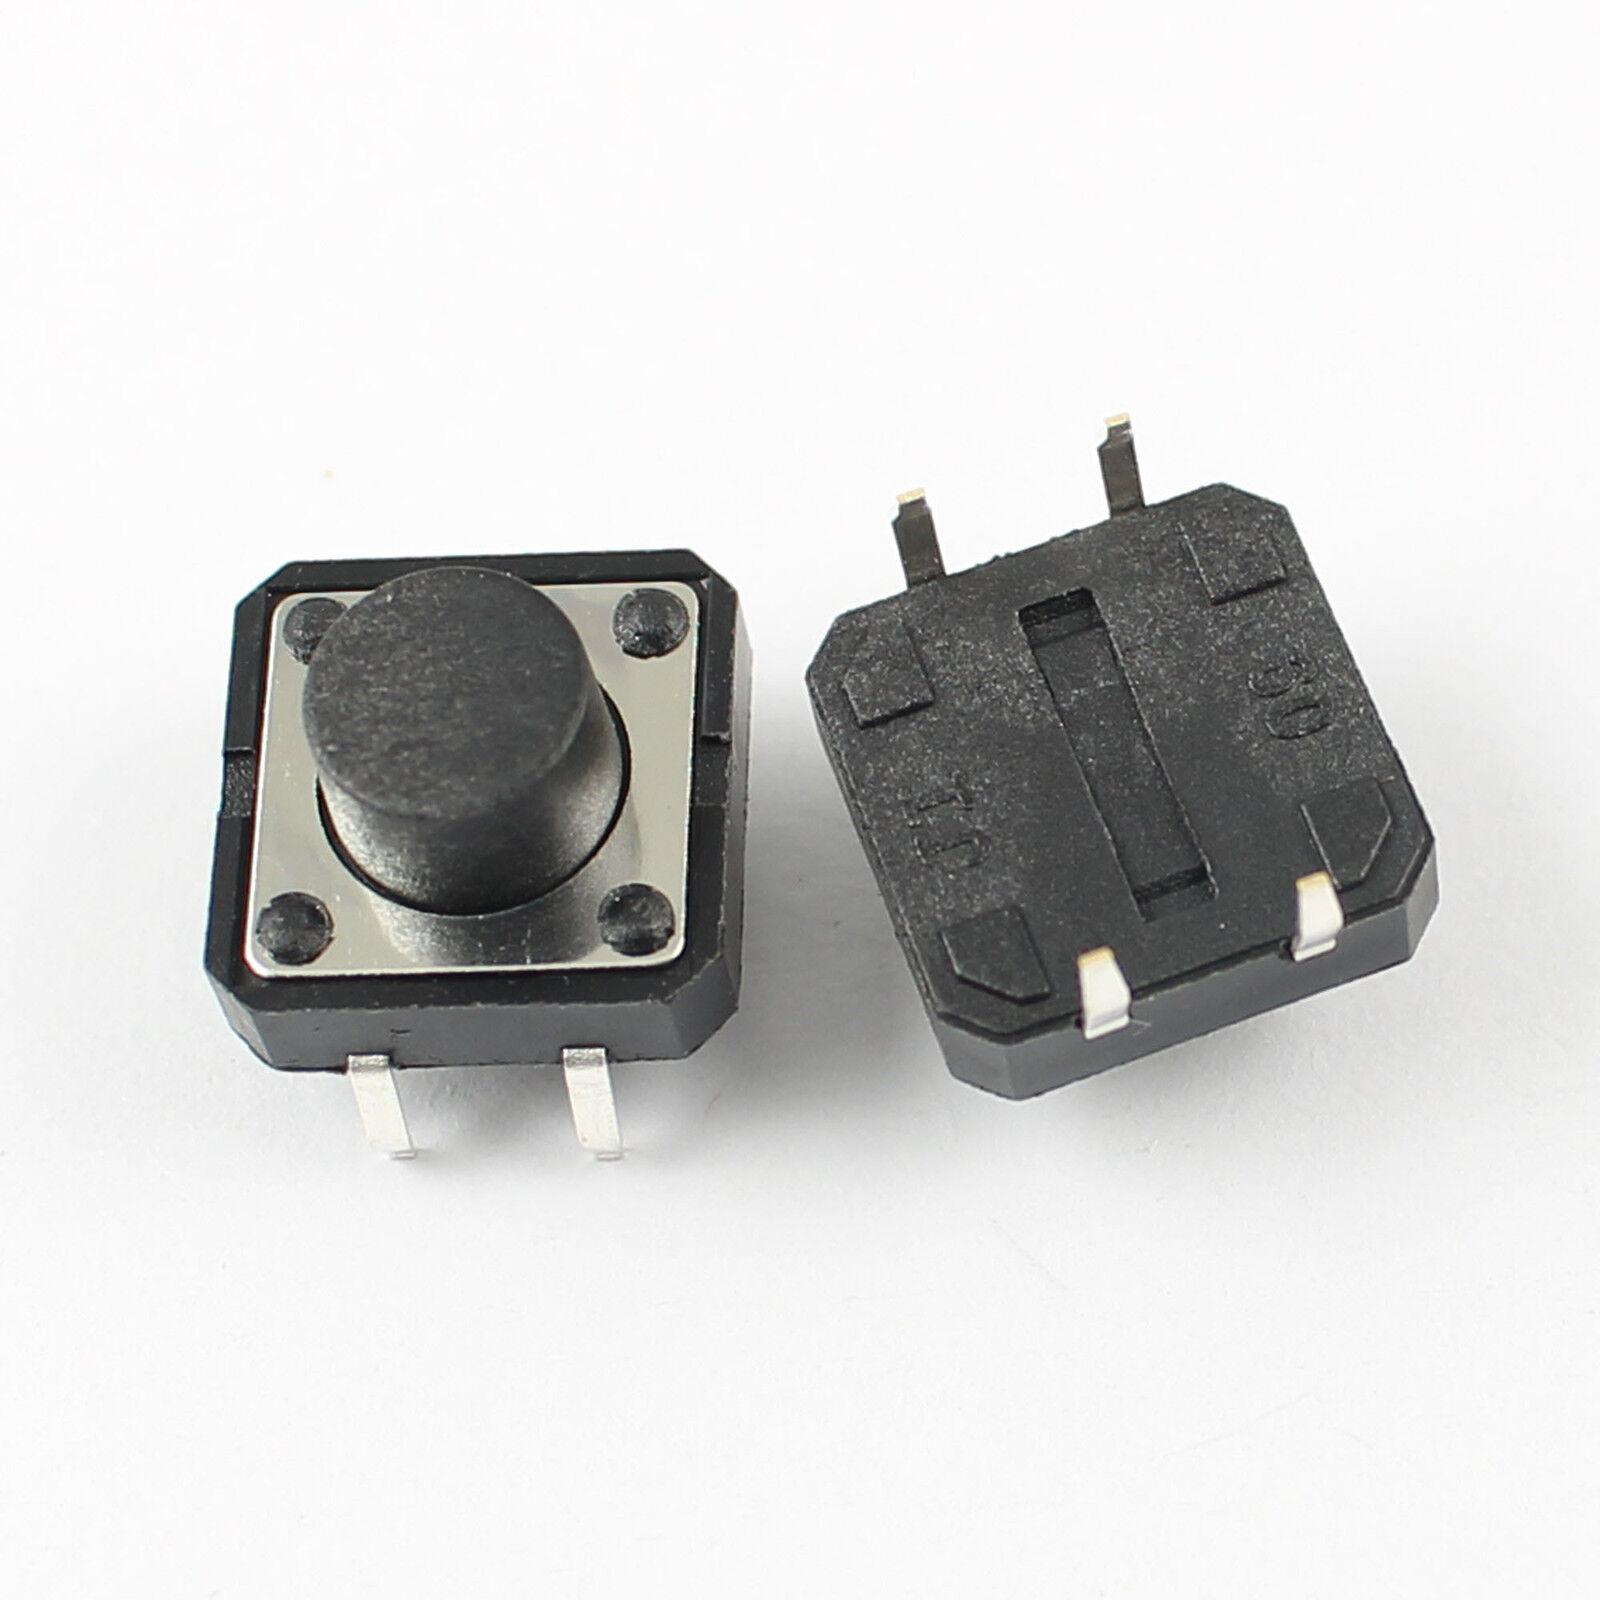 100pcs Momentary Tactile Tact Push Button Switch 4 Pin Dip 12x12x7 5mm 12x12x75mm